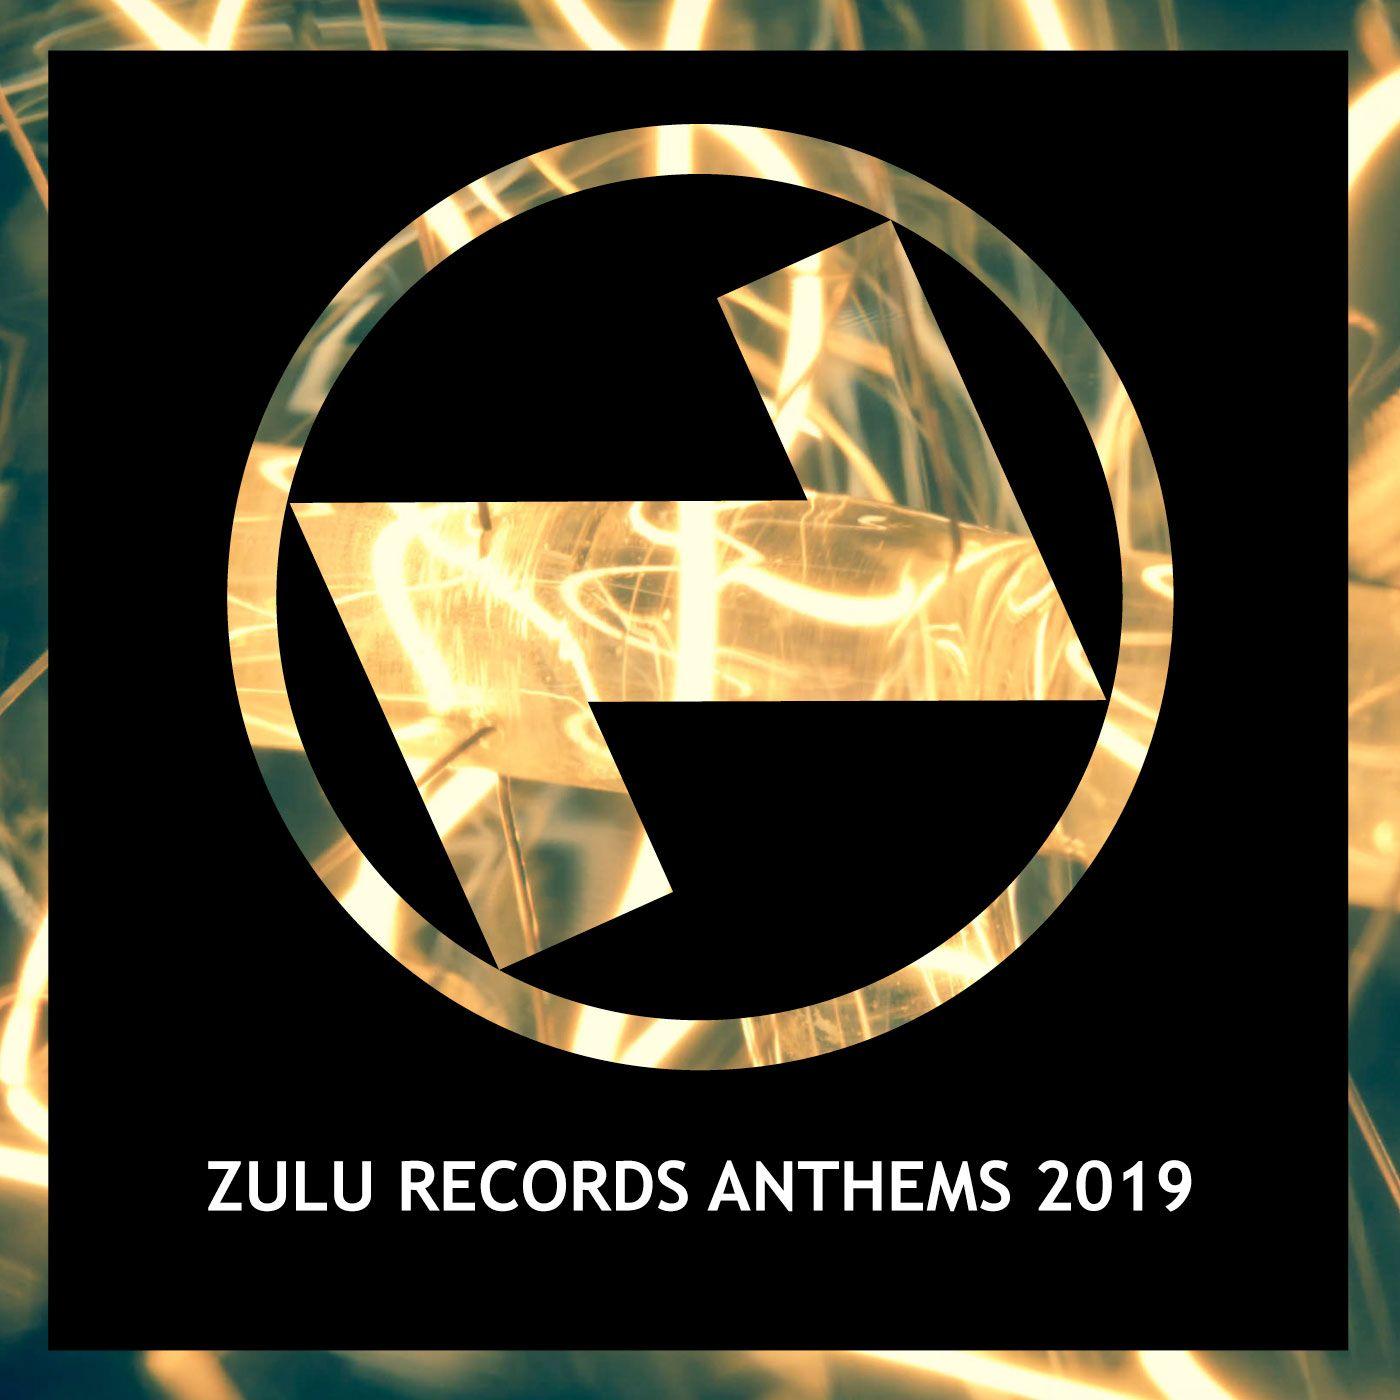 zulu913c_anthems_2019.jpg